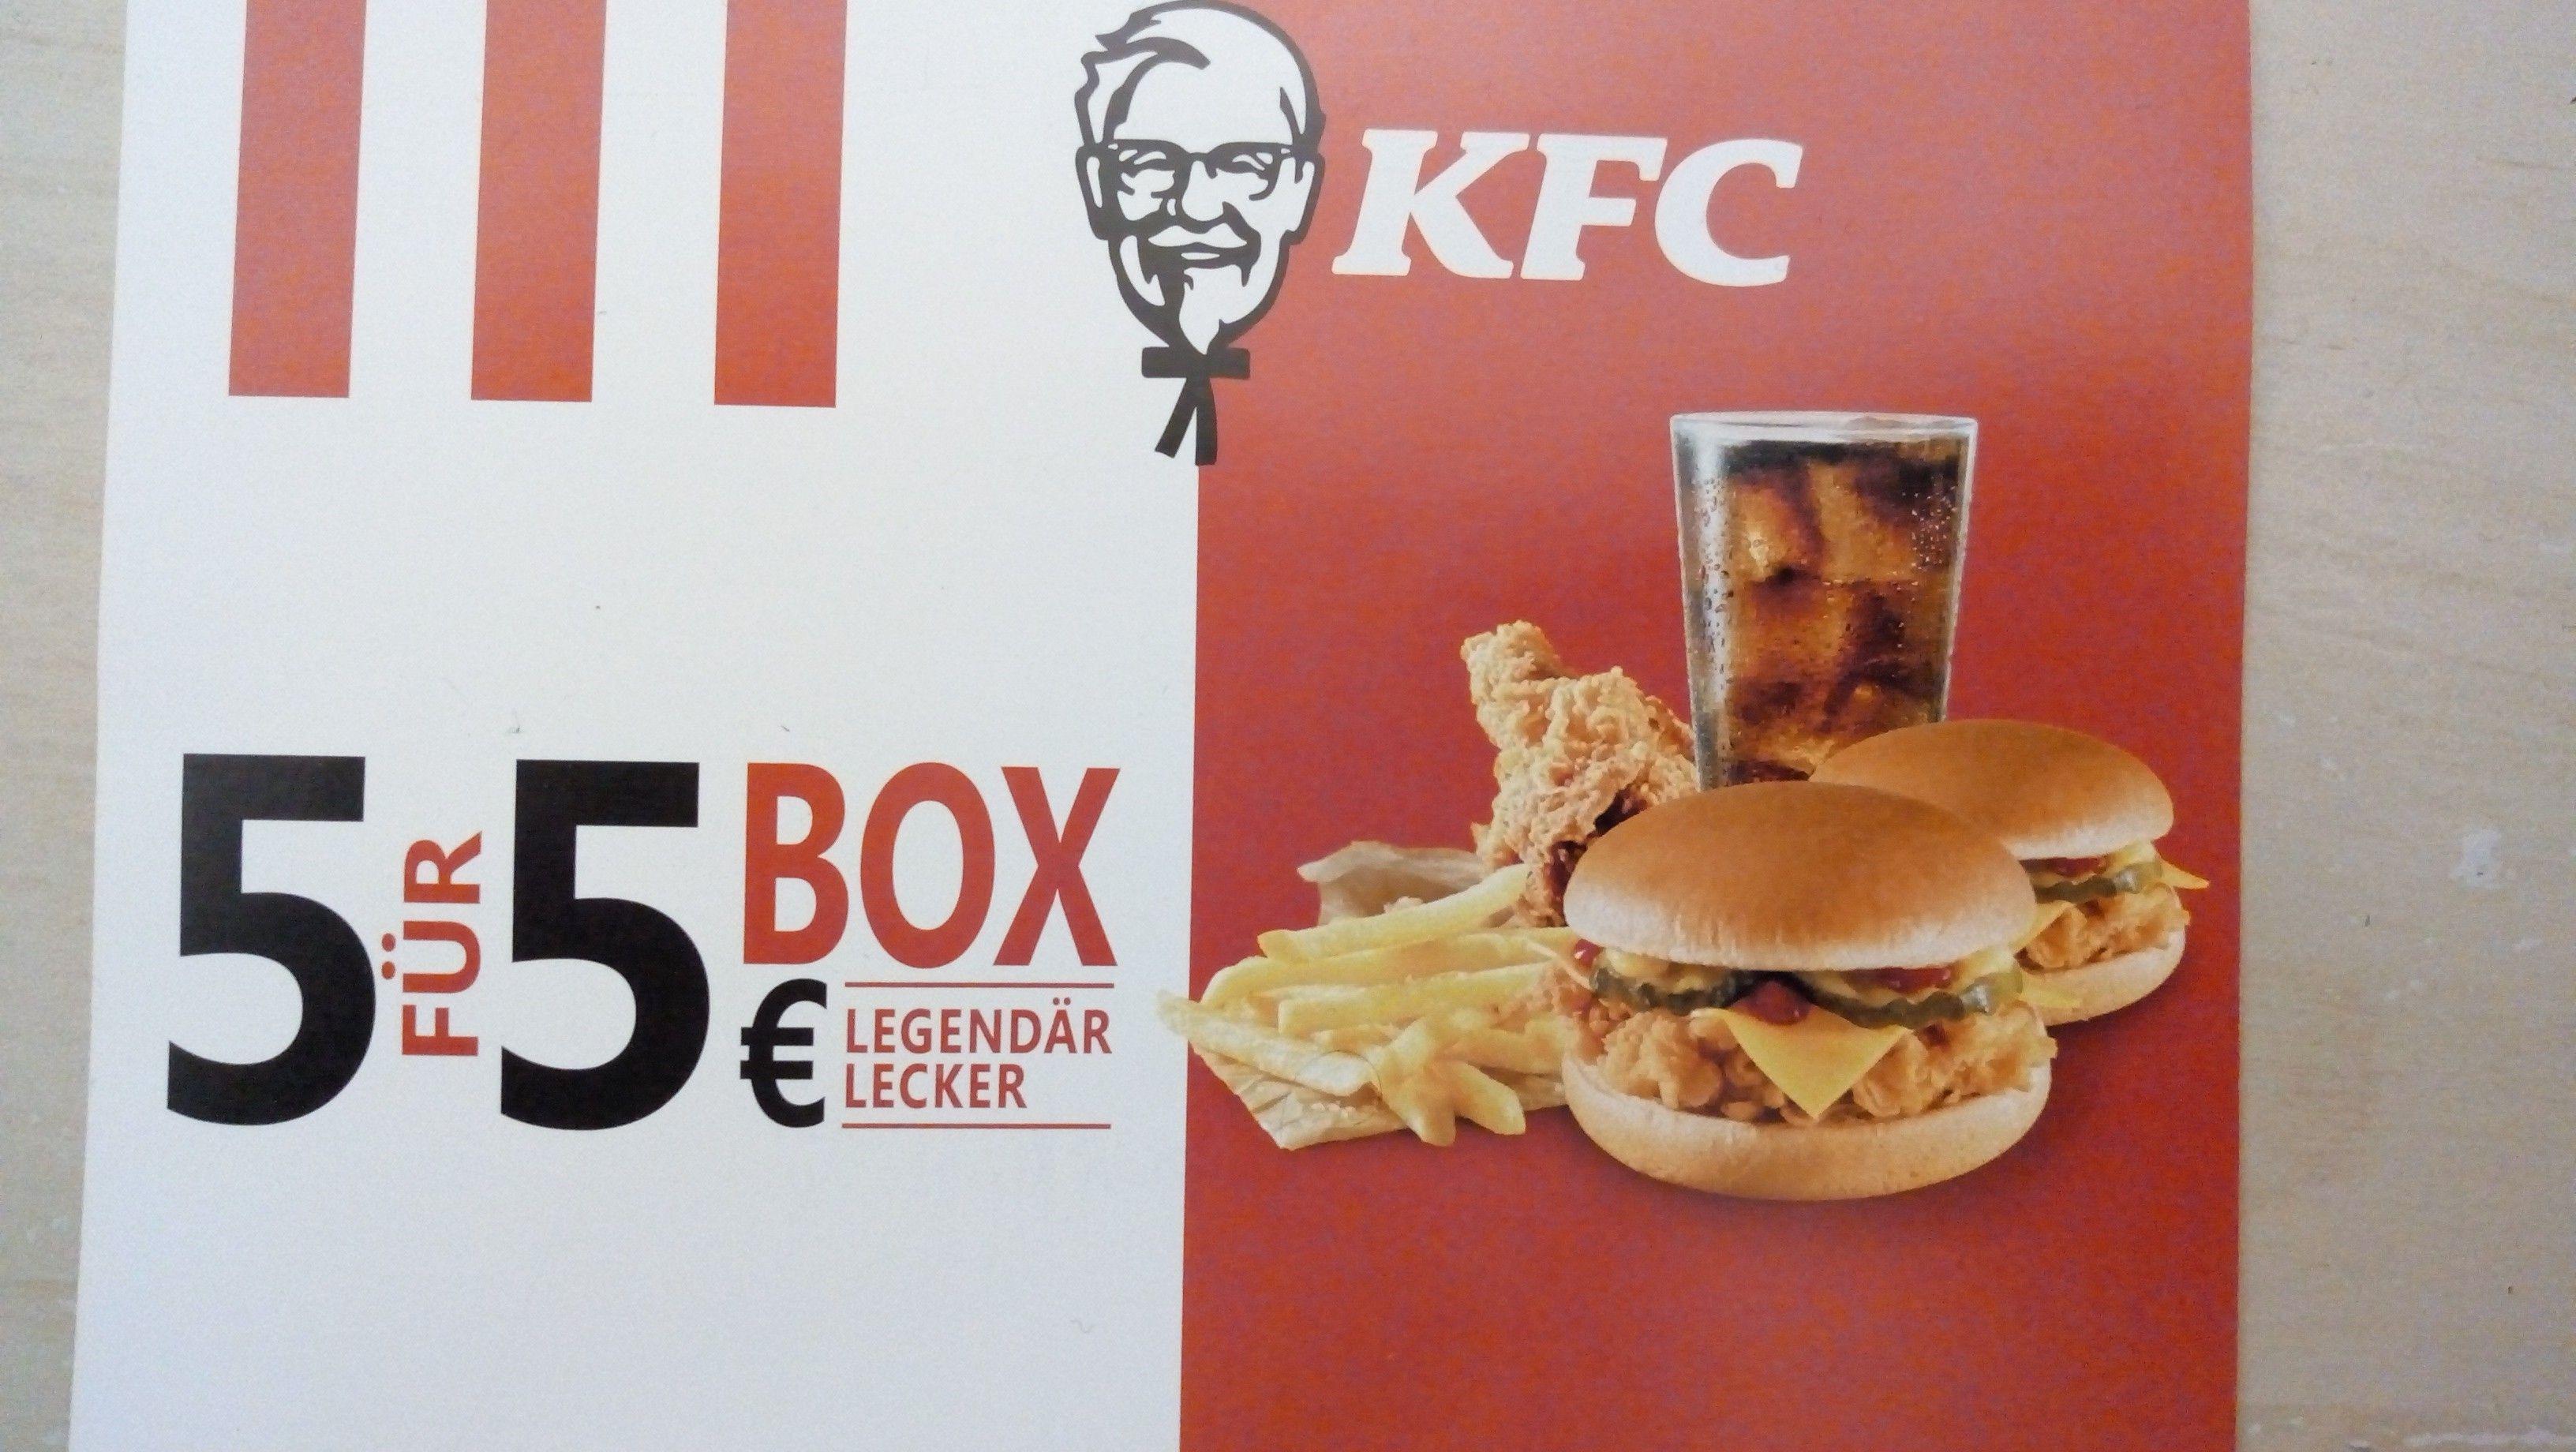 [KFCAnsfelden] 5 für 5 Euro Box (2x Cheeseburger, Pommes, Hotwing, Getränk)